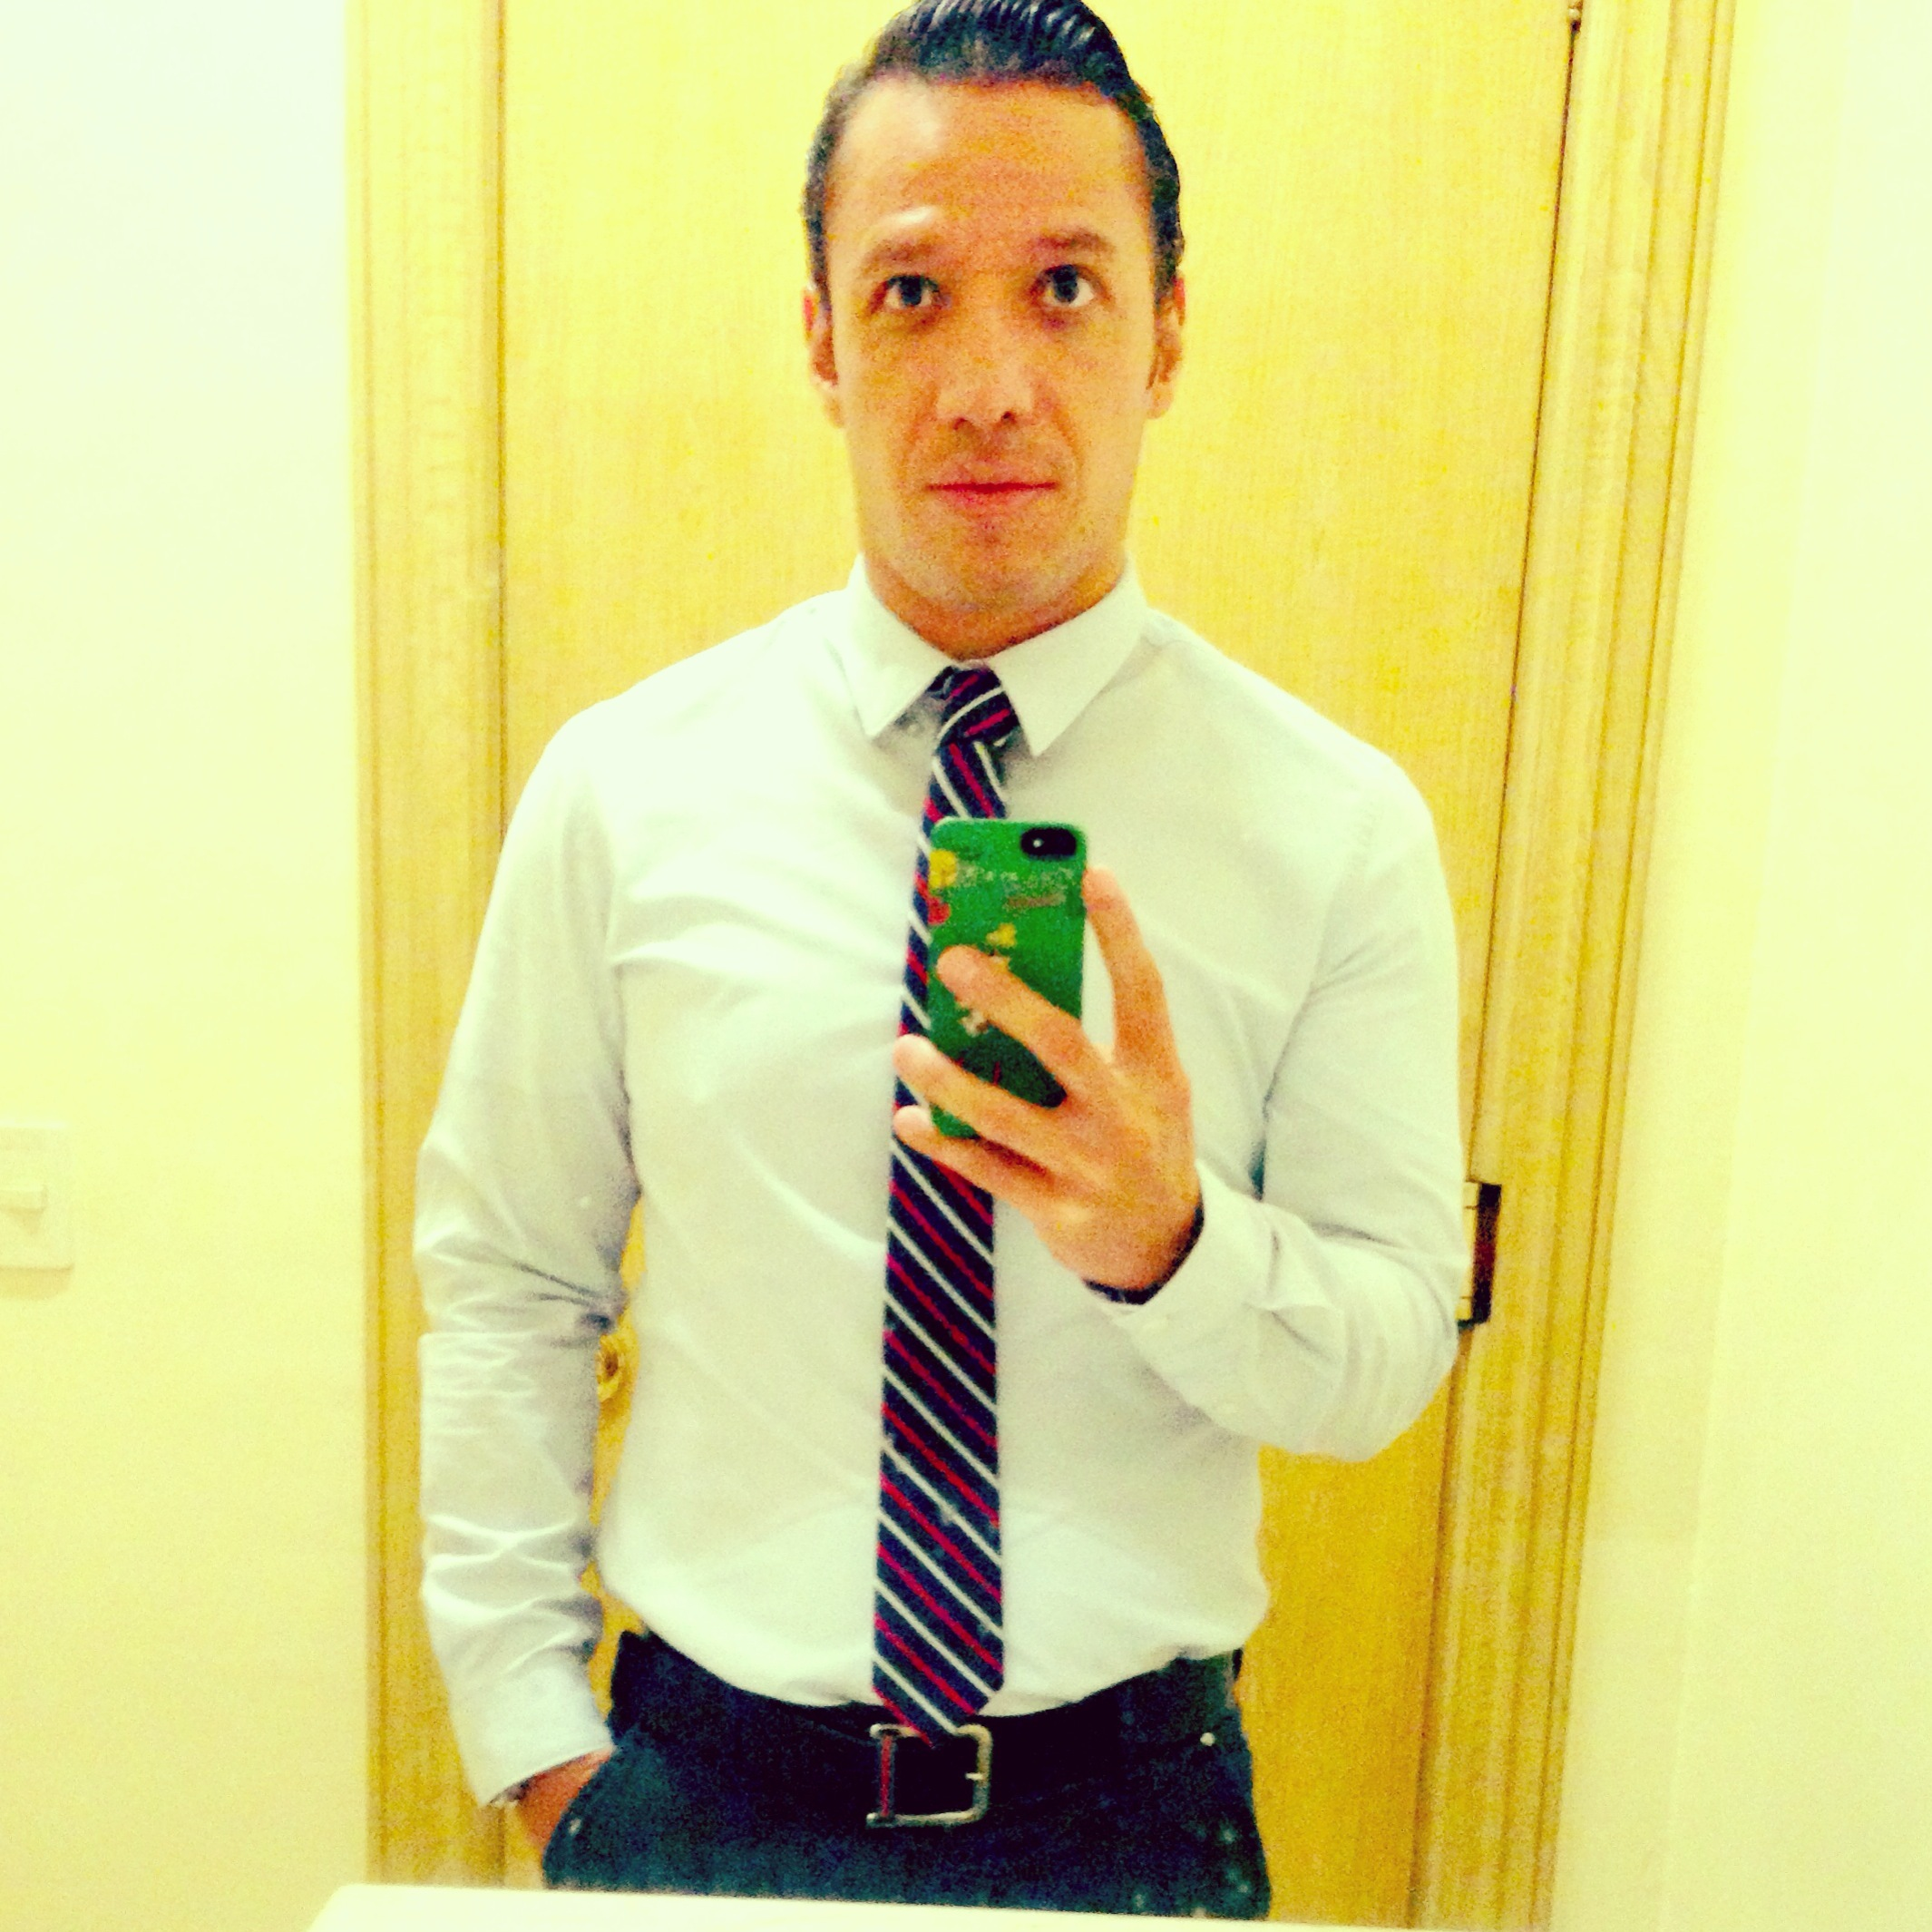 josé Luis Ramírez Carrera